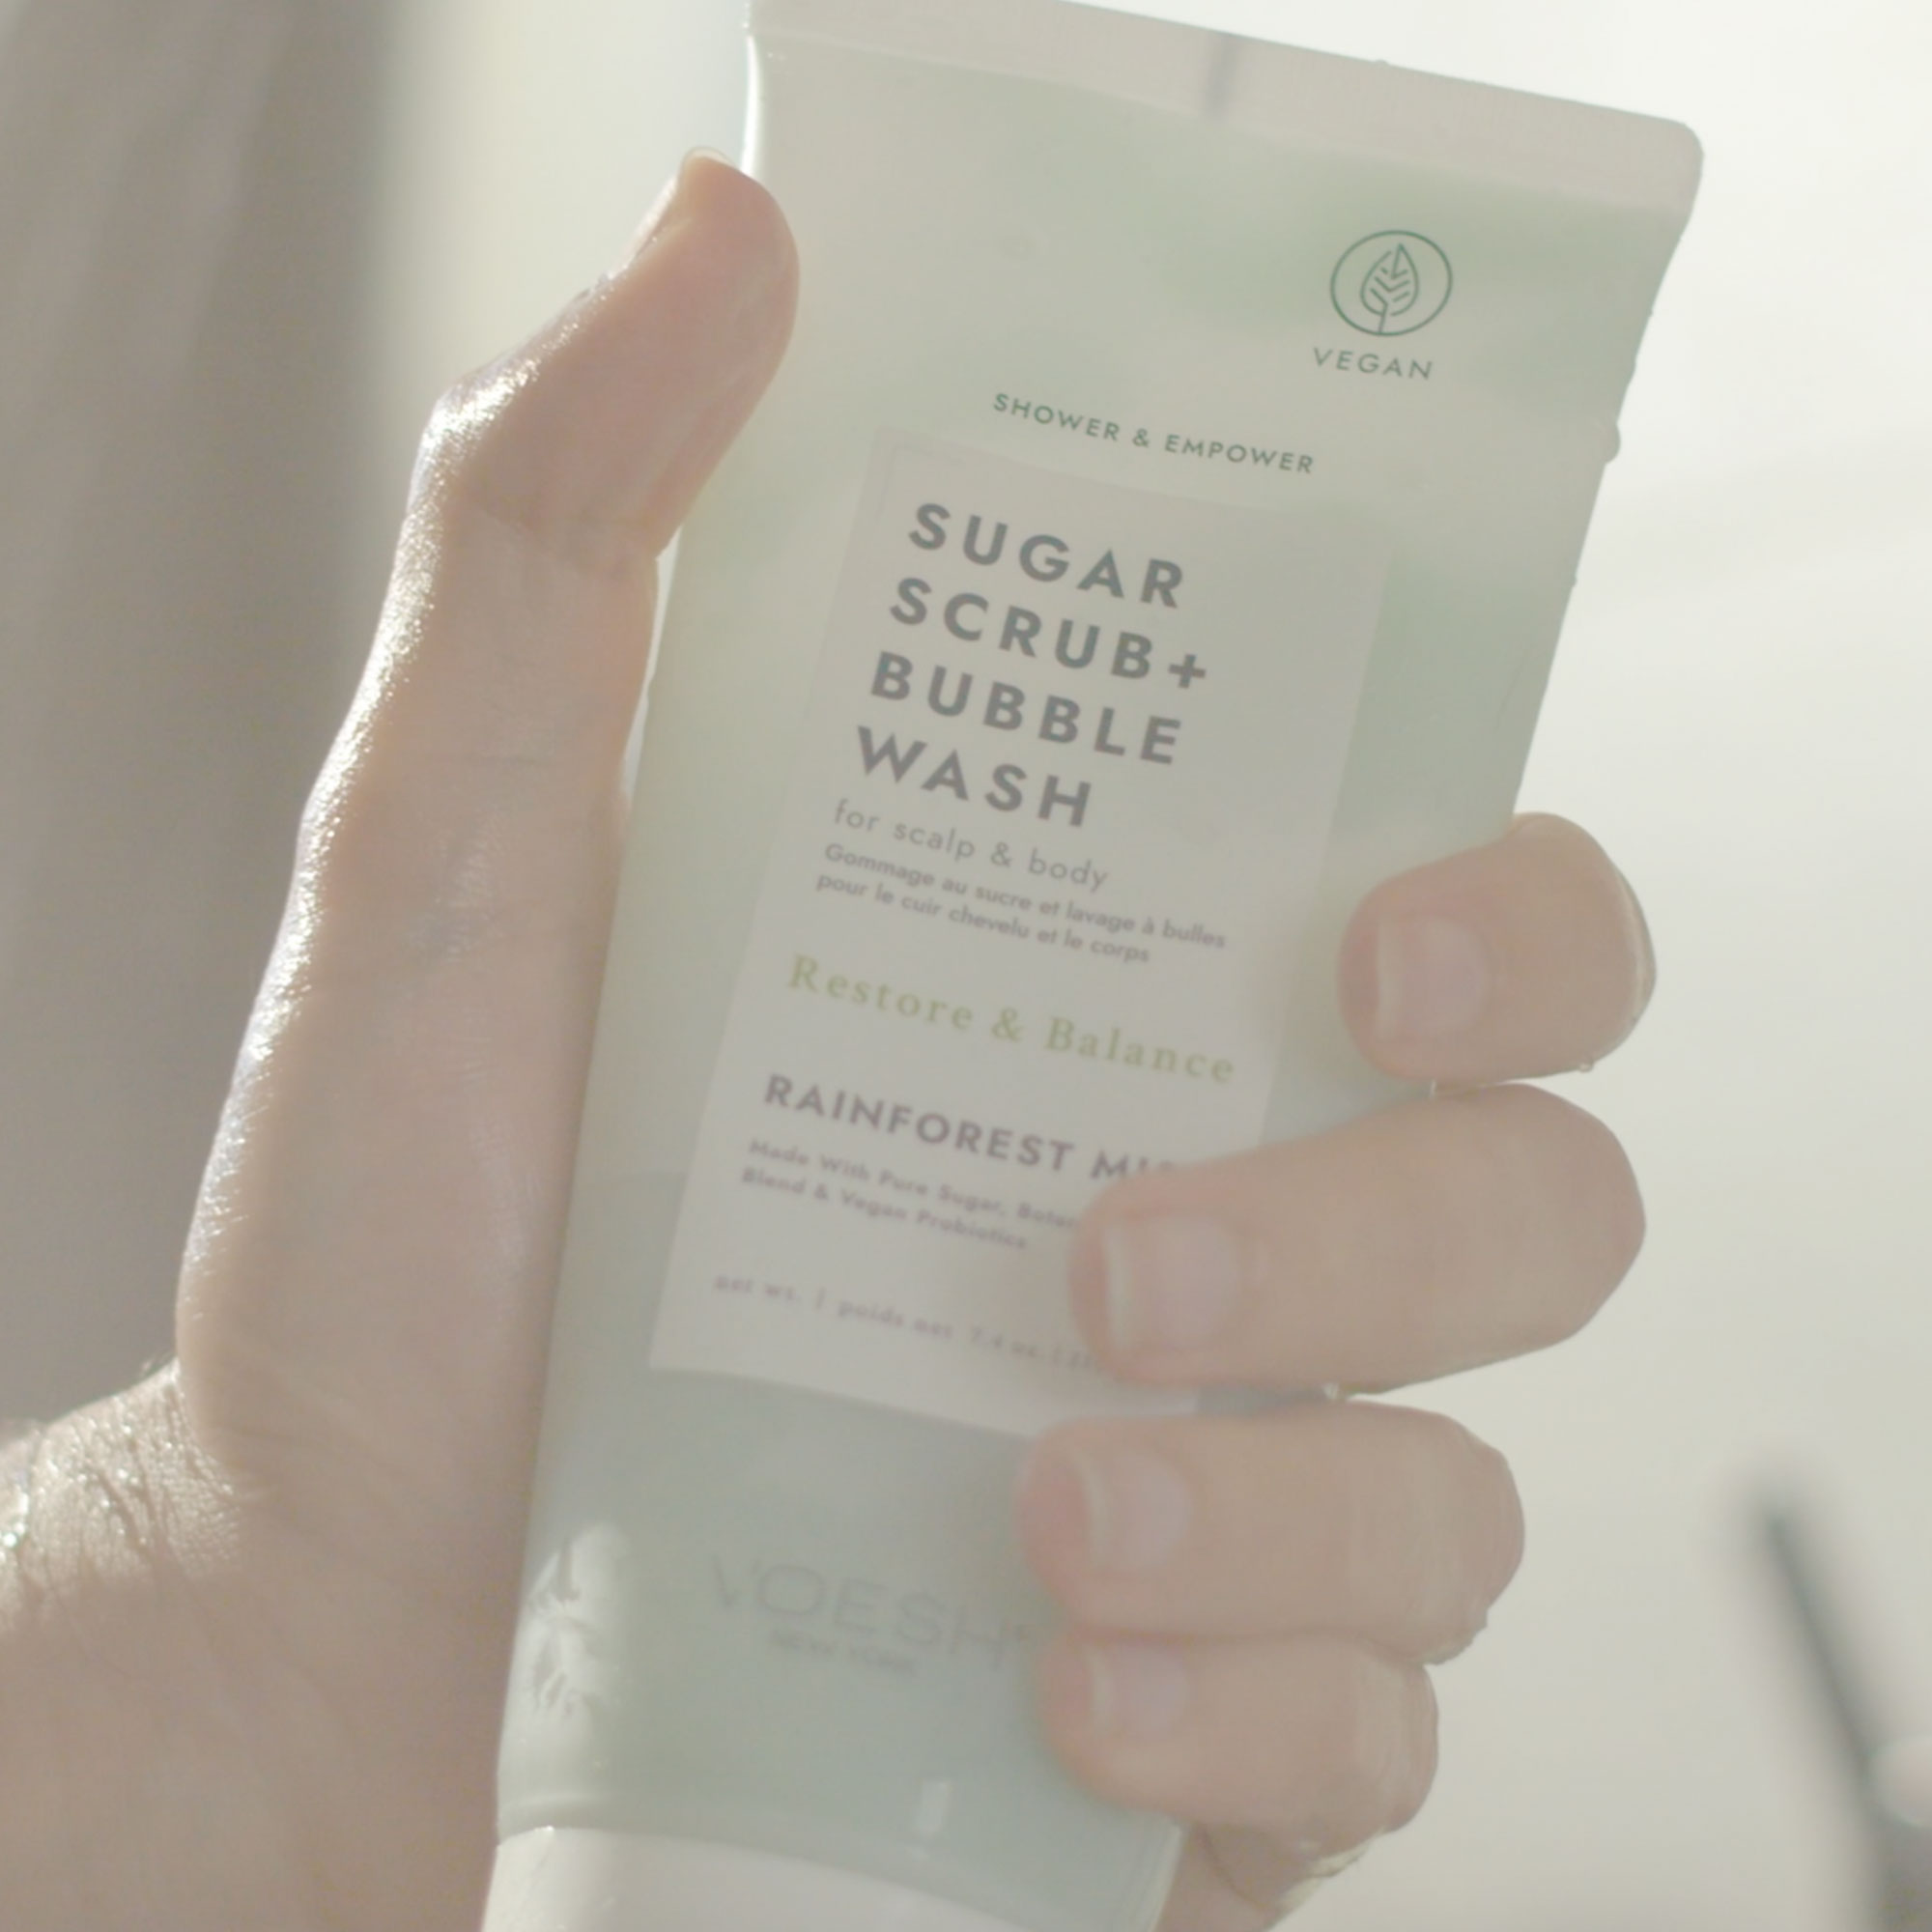 Rainforest Mist Sugar Scrub + Bubble Wash For Scalp & Body